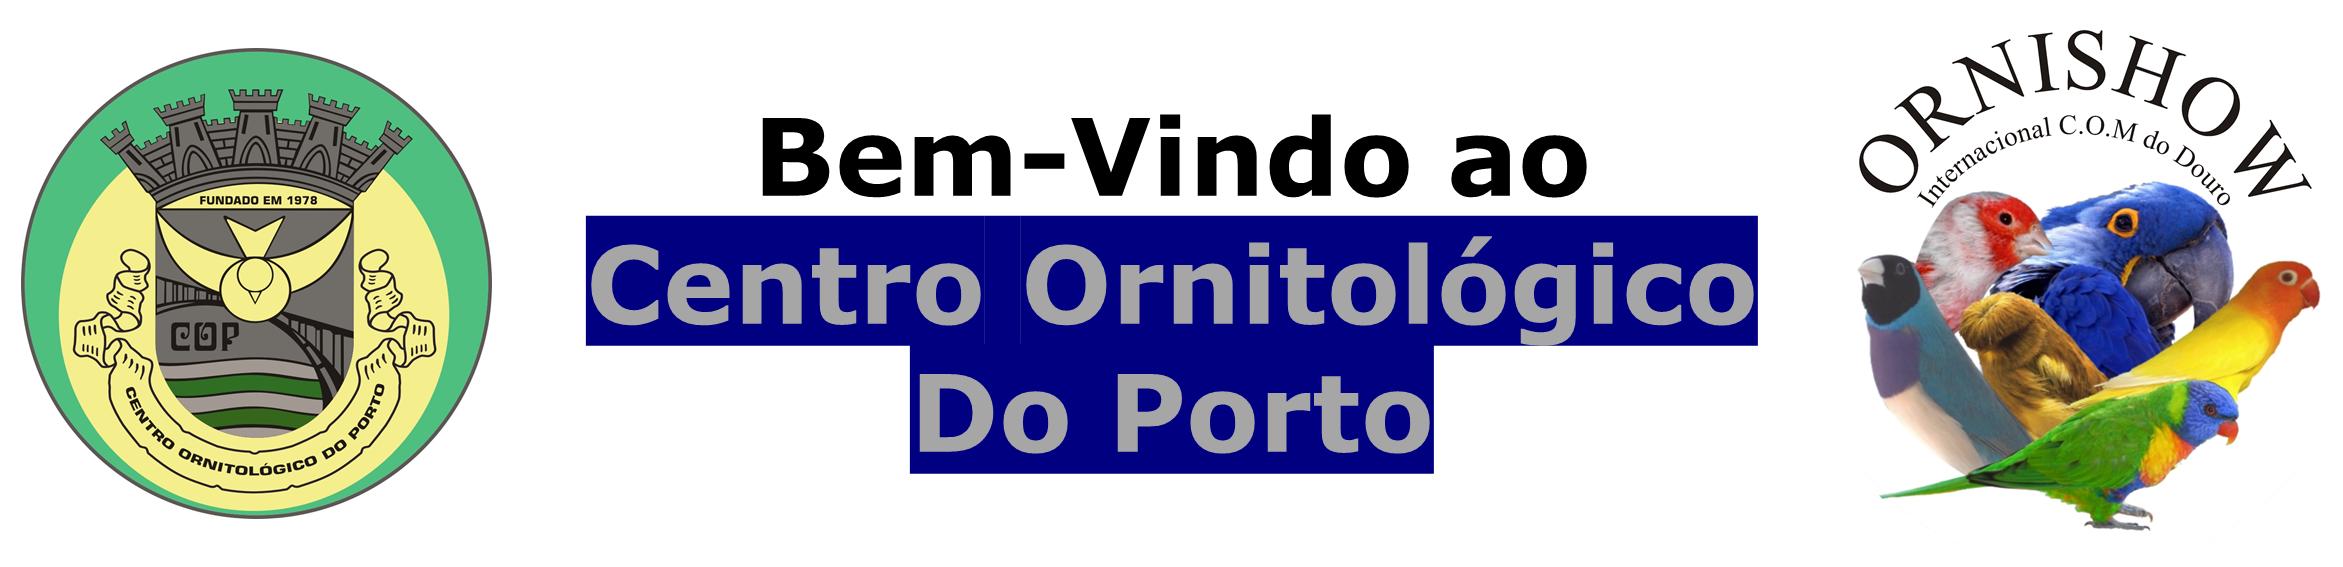 Centro Ornitológico do Porto